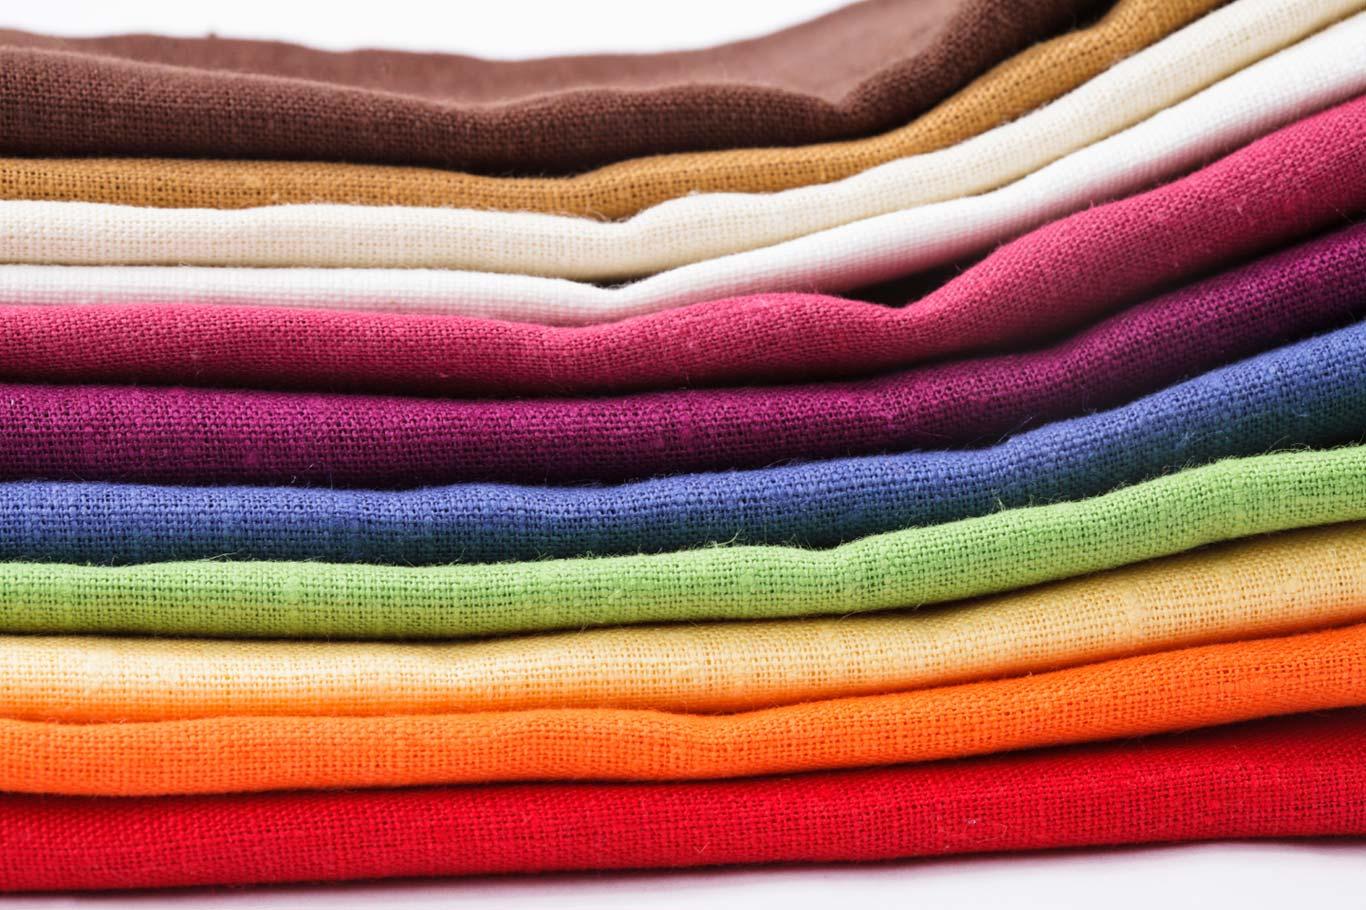 Knit Fabric Processing Pdf : Hürteks tekstil